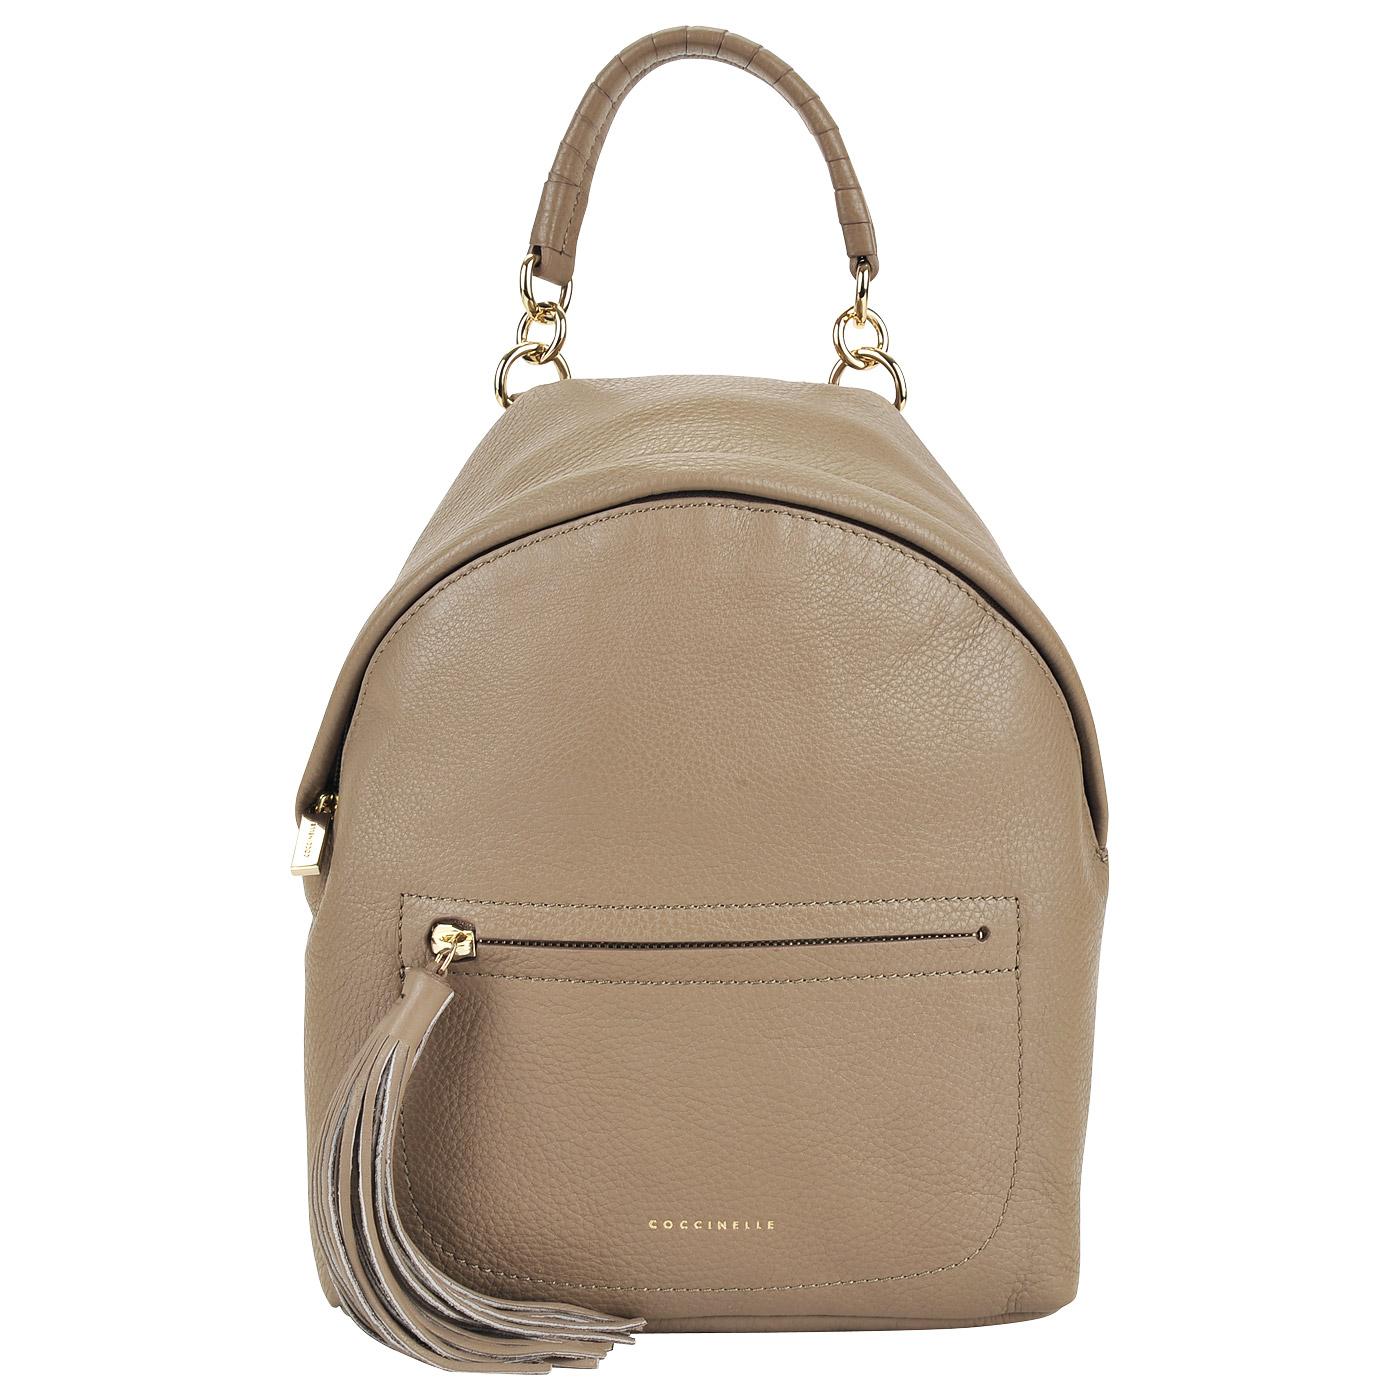 a171973be24f Женский кожаный рюкзак с одним отделом Coccinelle Leonie AN0 54 03 ...